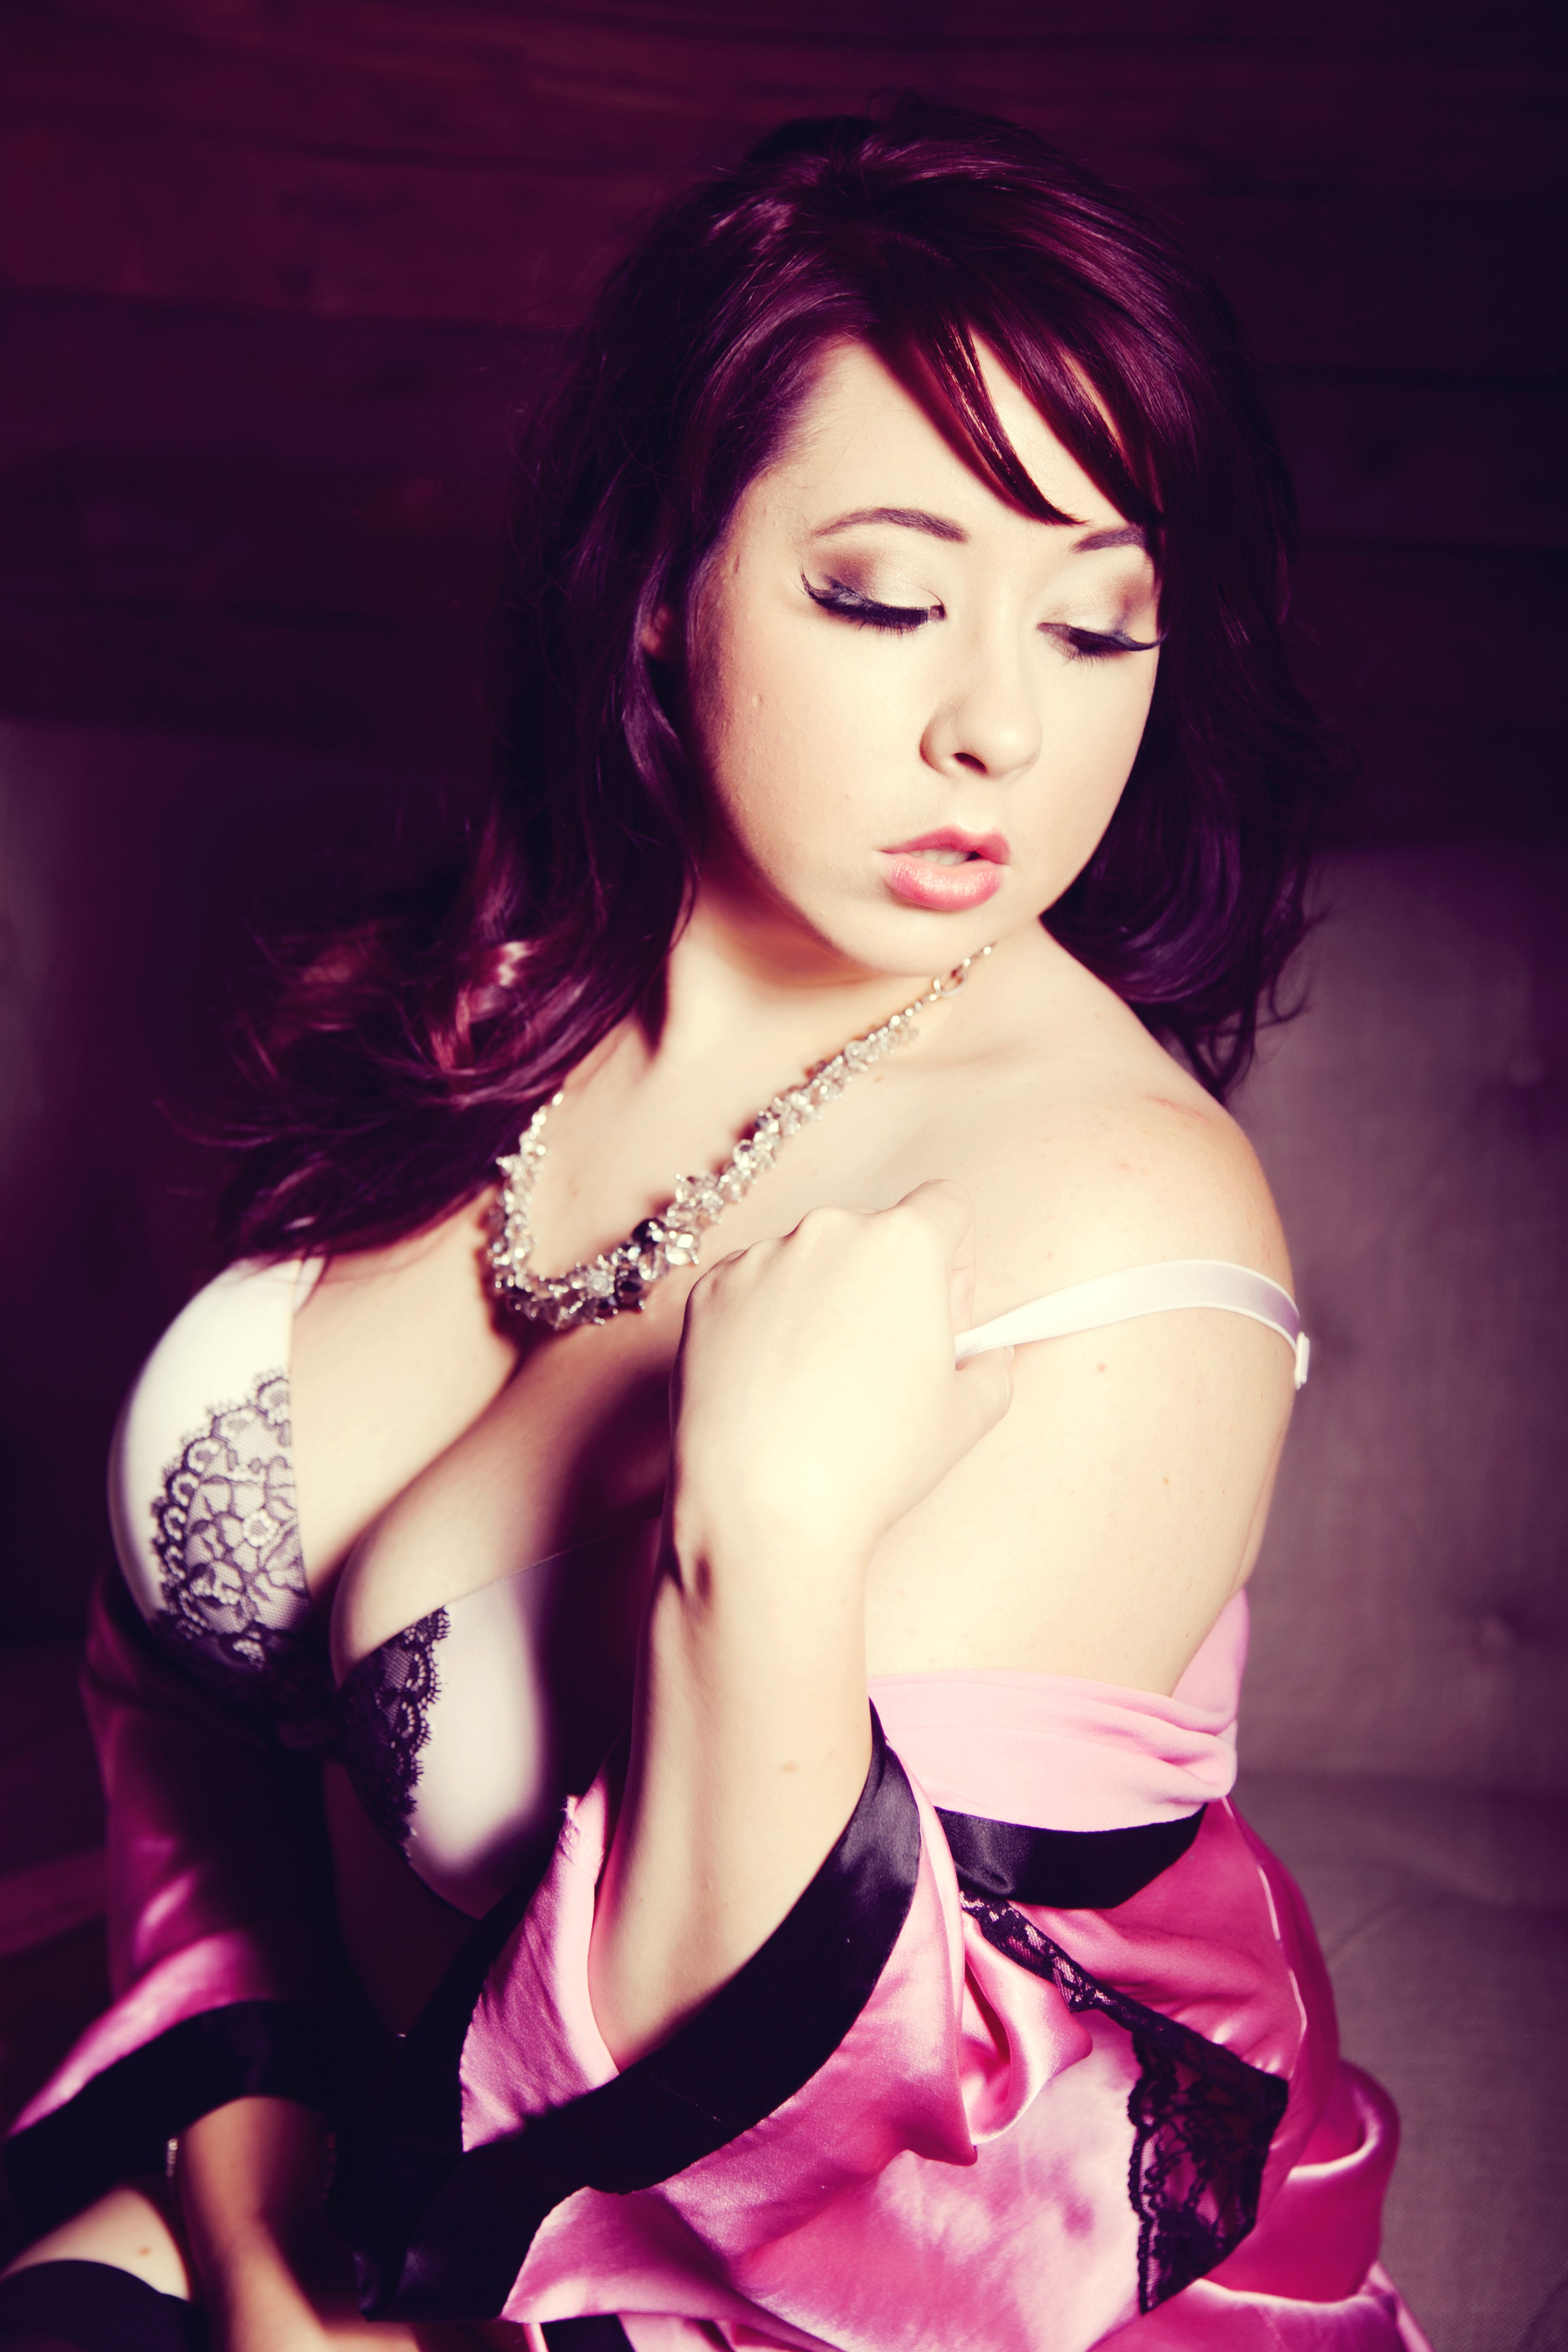 Tasteful boudoir pose.   Autumn Clarkson  2013 by Ultra-Spective Photography